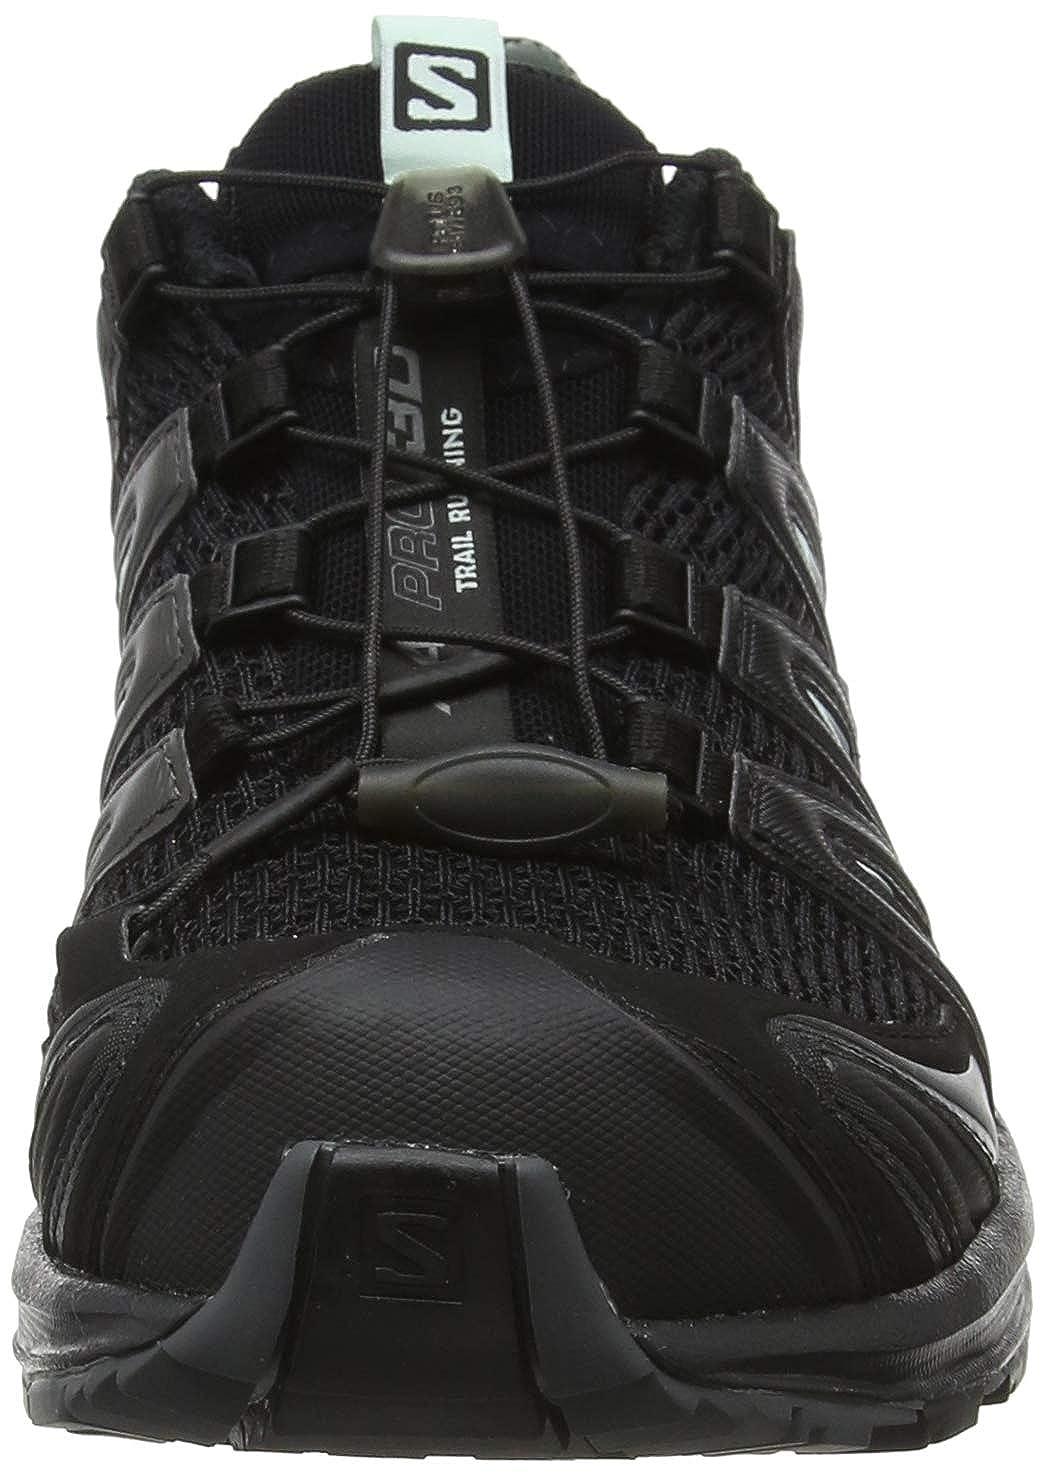 Salomon Damen Xa Xa Xa Pro 3D Trailrunning-Schuhe  467648